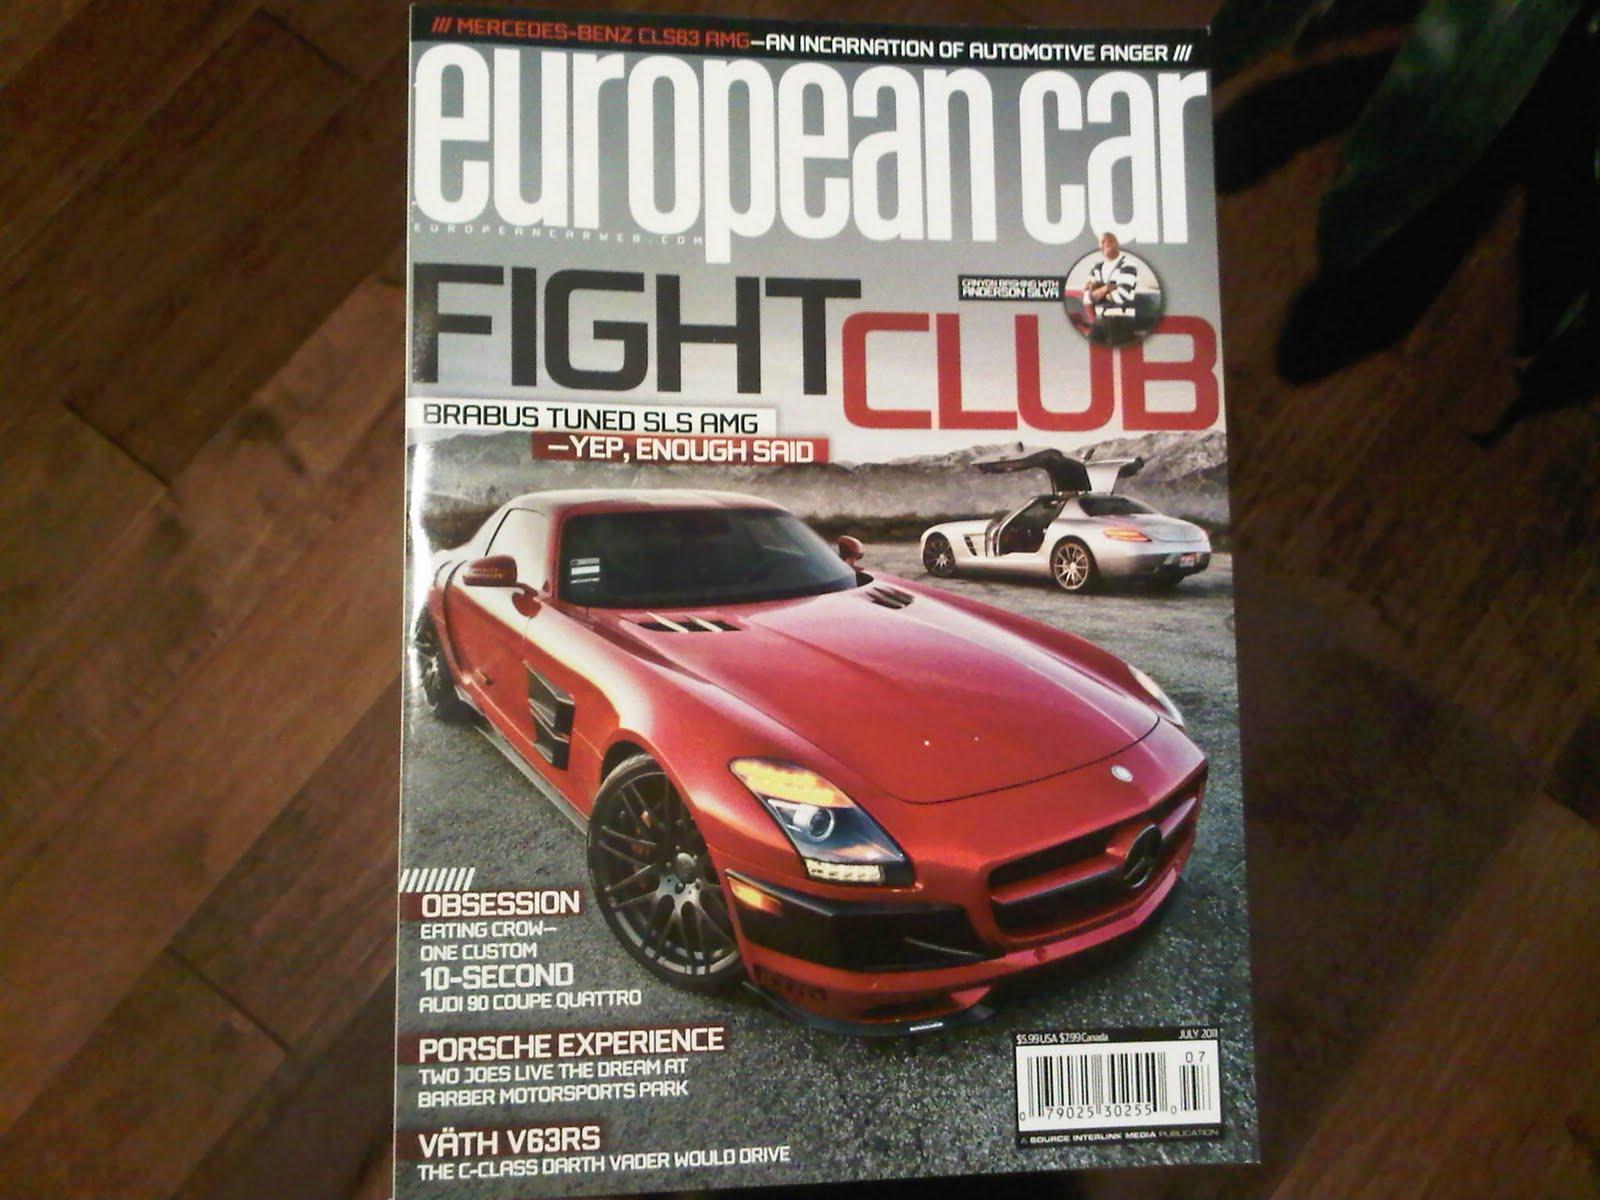 Singh Autosport Front Cover Of European Car